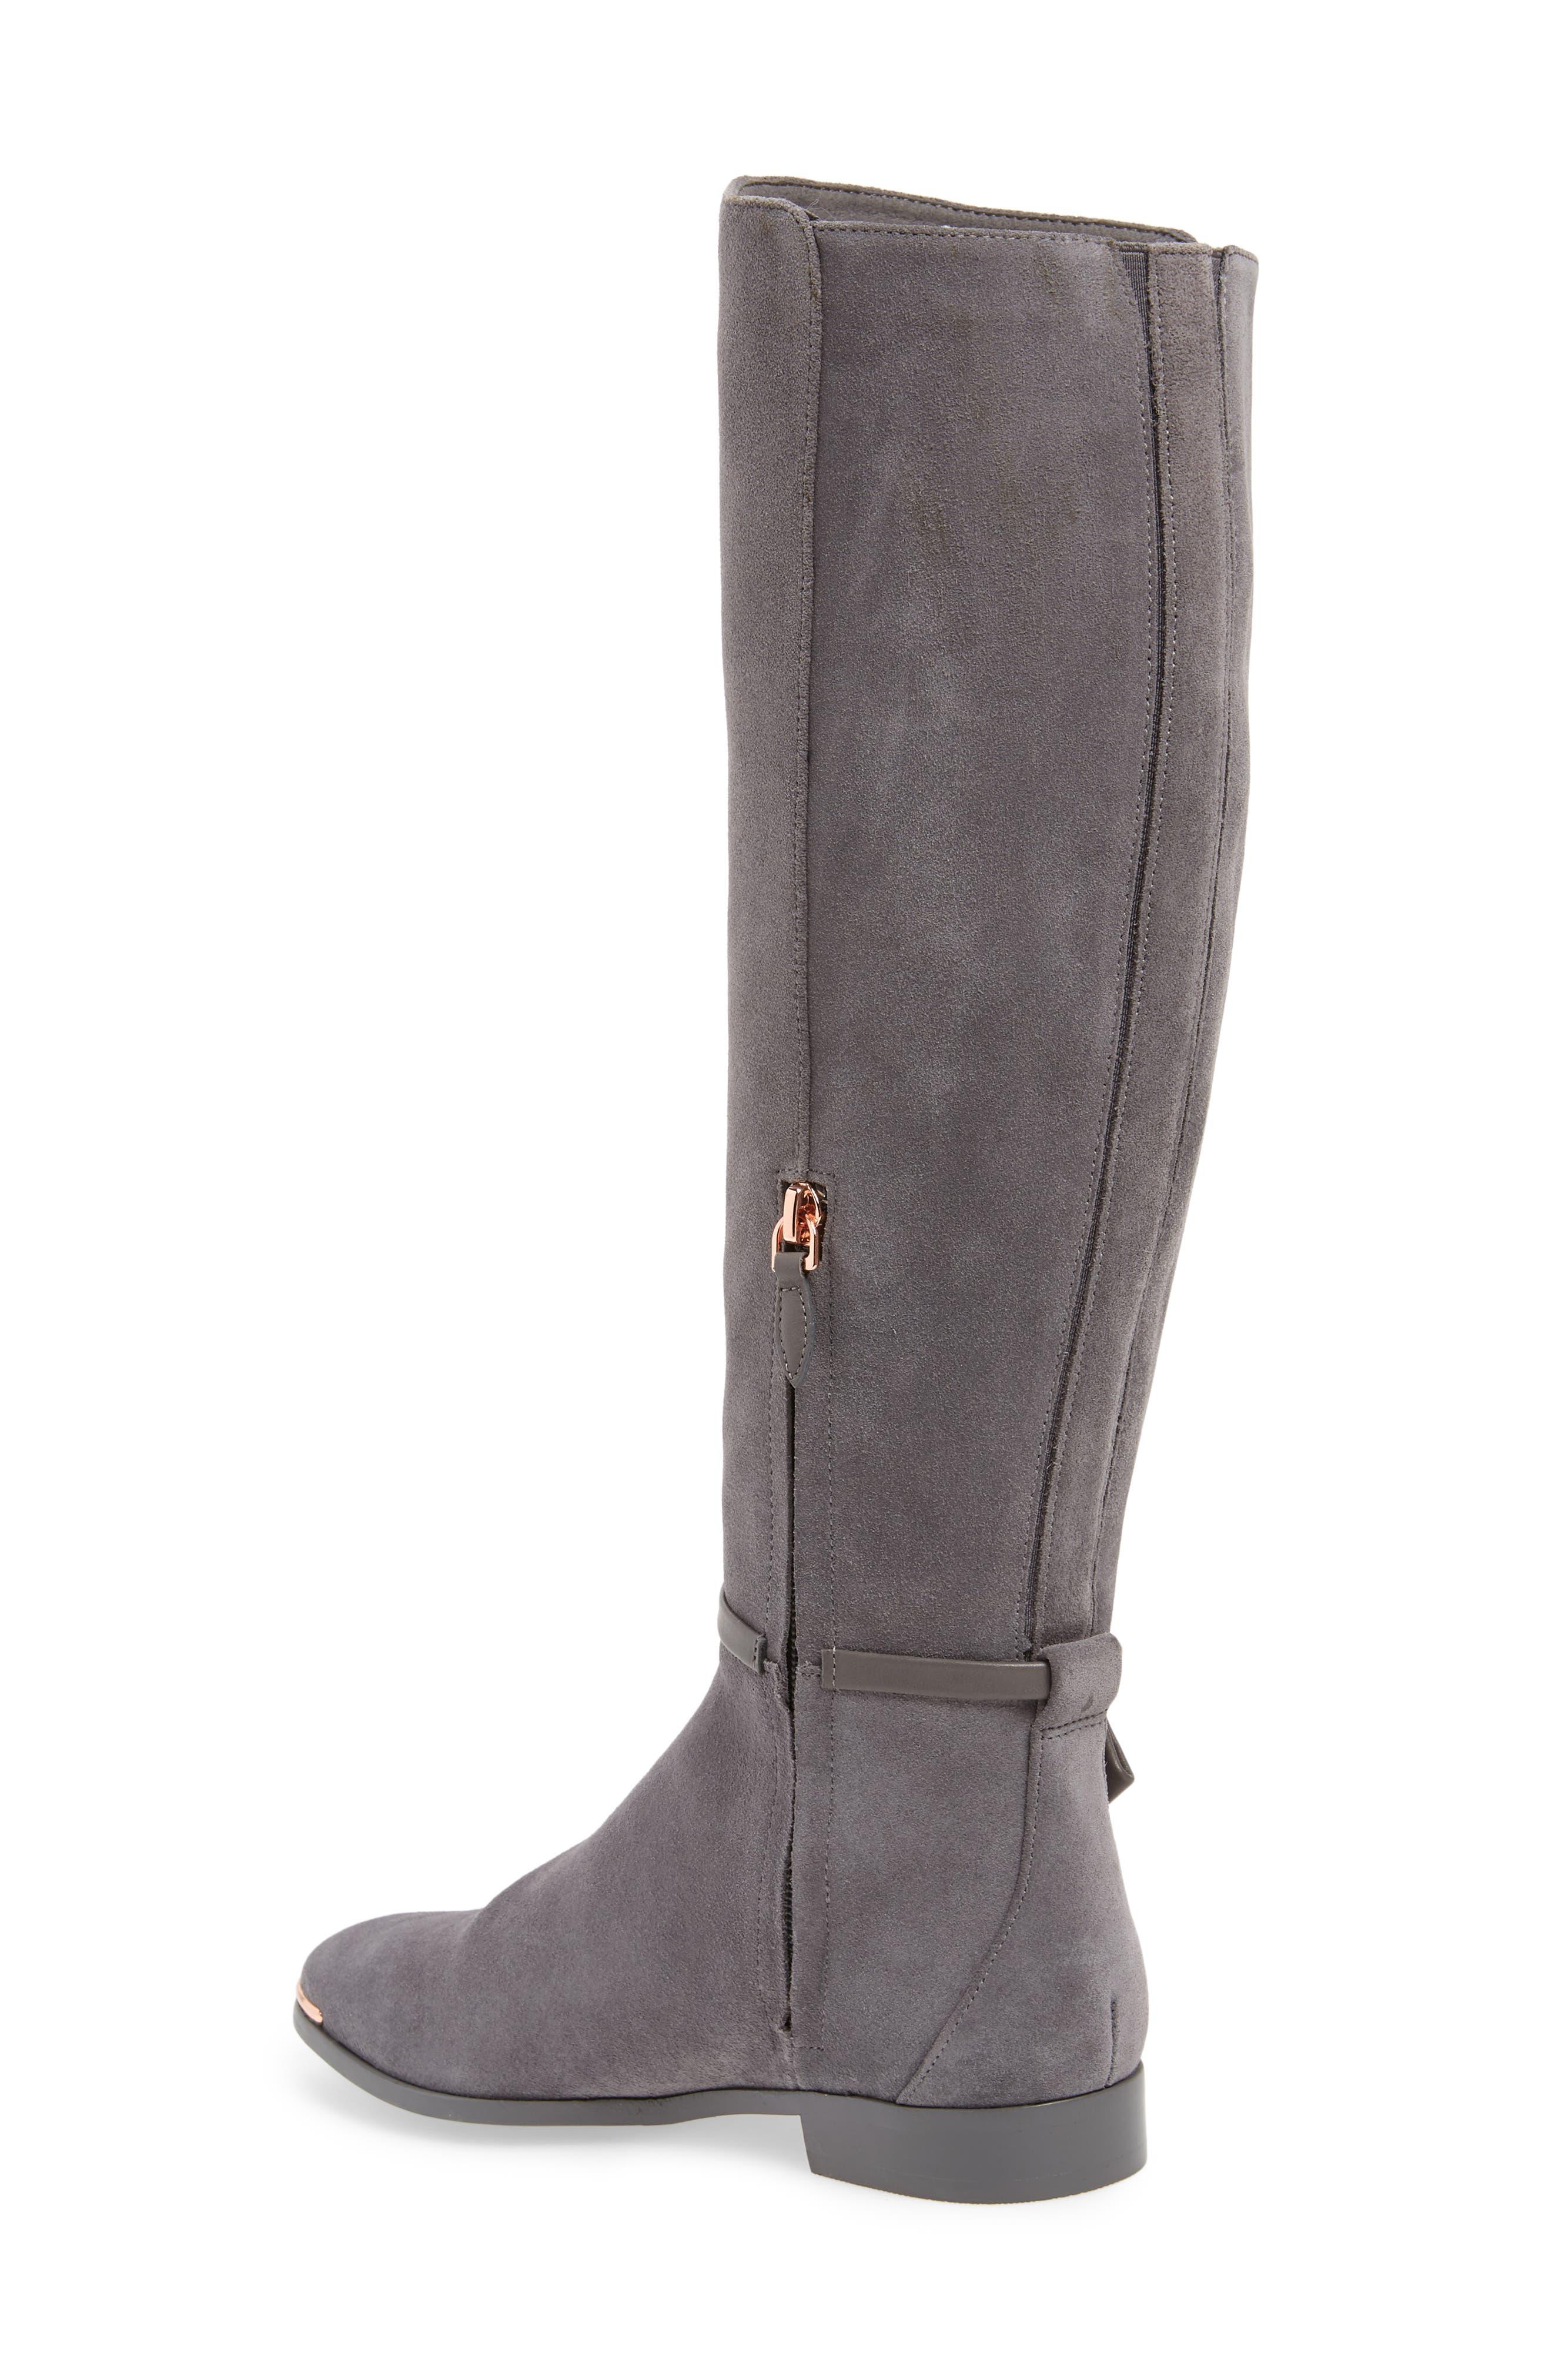 92bdf8a46b3dc Women s Boots Ted Baker London